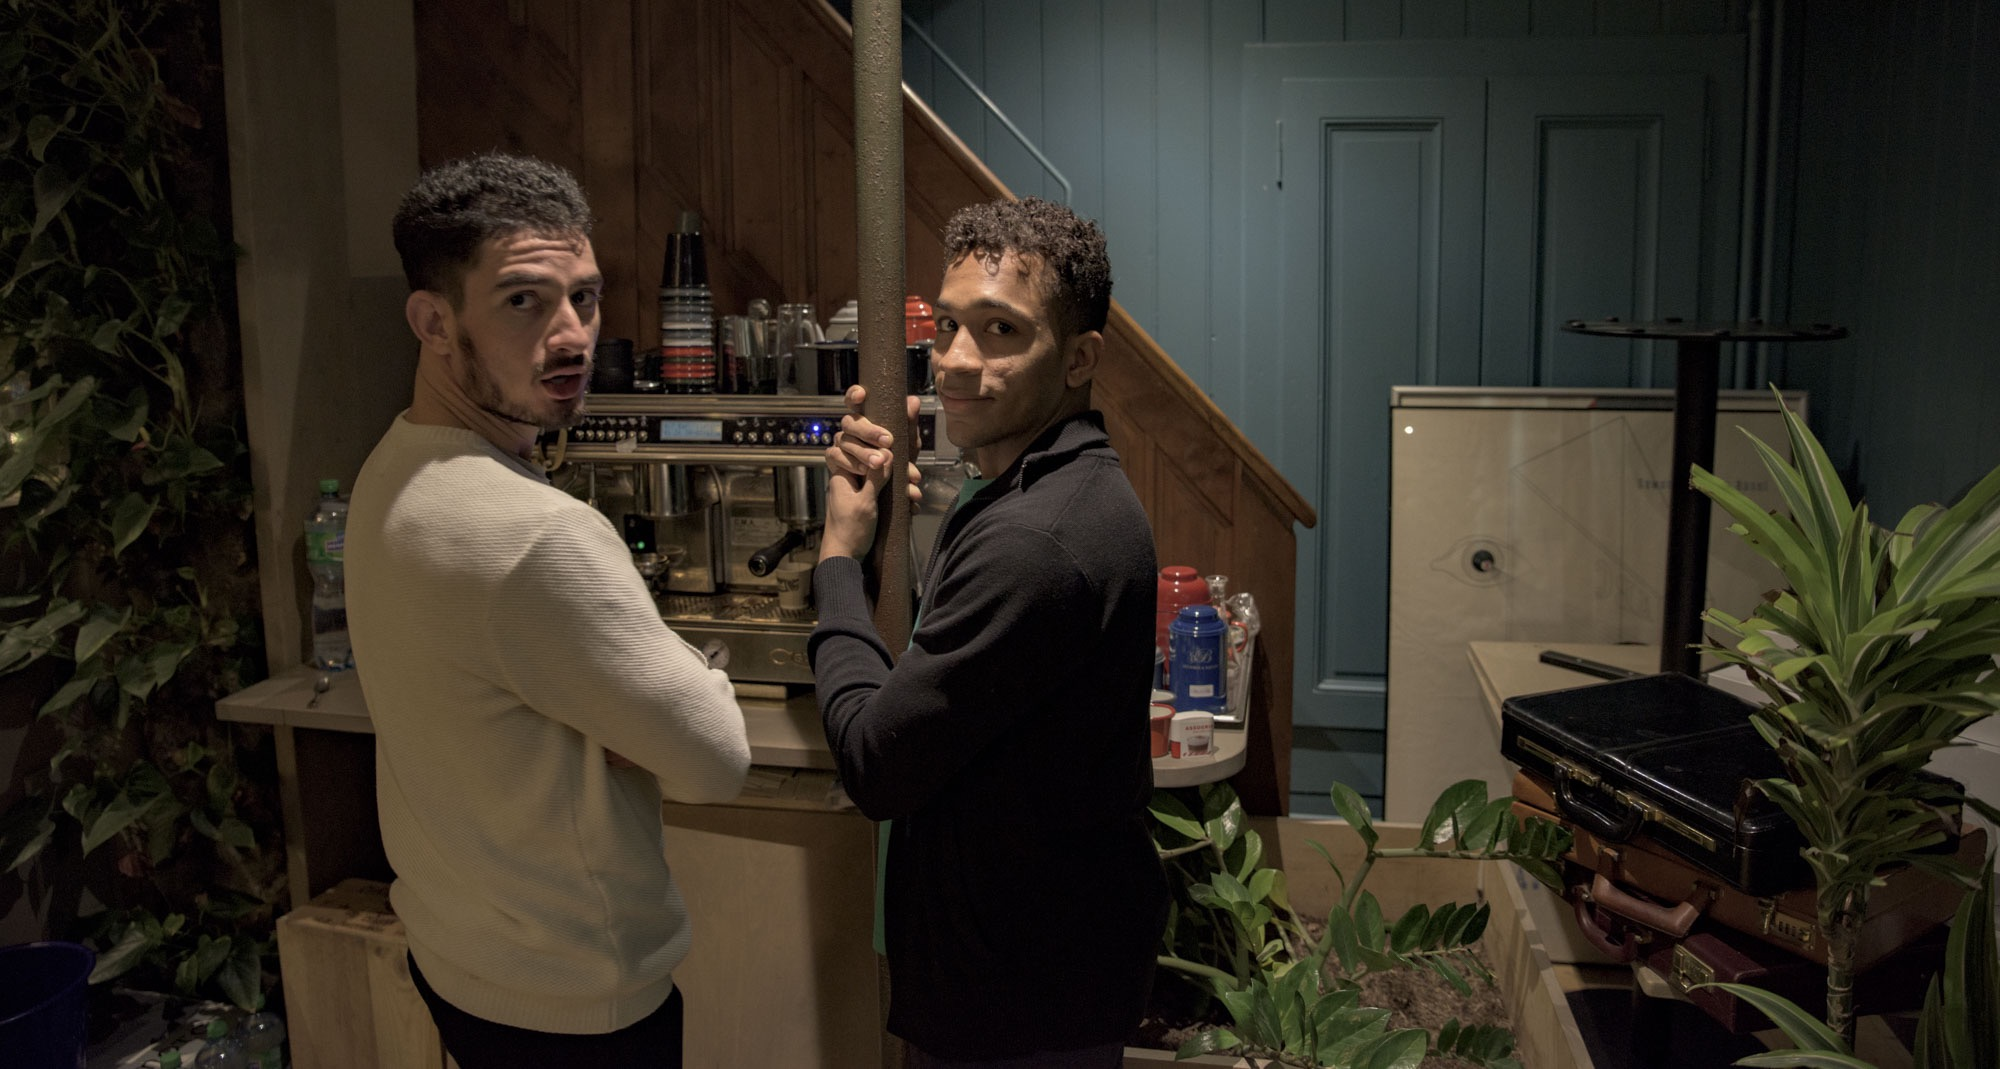 Jonathan Gonzalez Reyes & Wendel Mota 5 ©Frederic Garcia.jpg